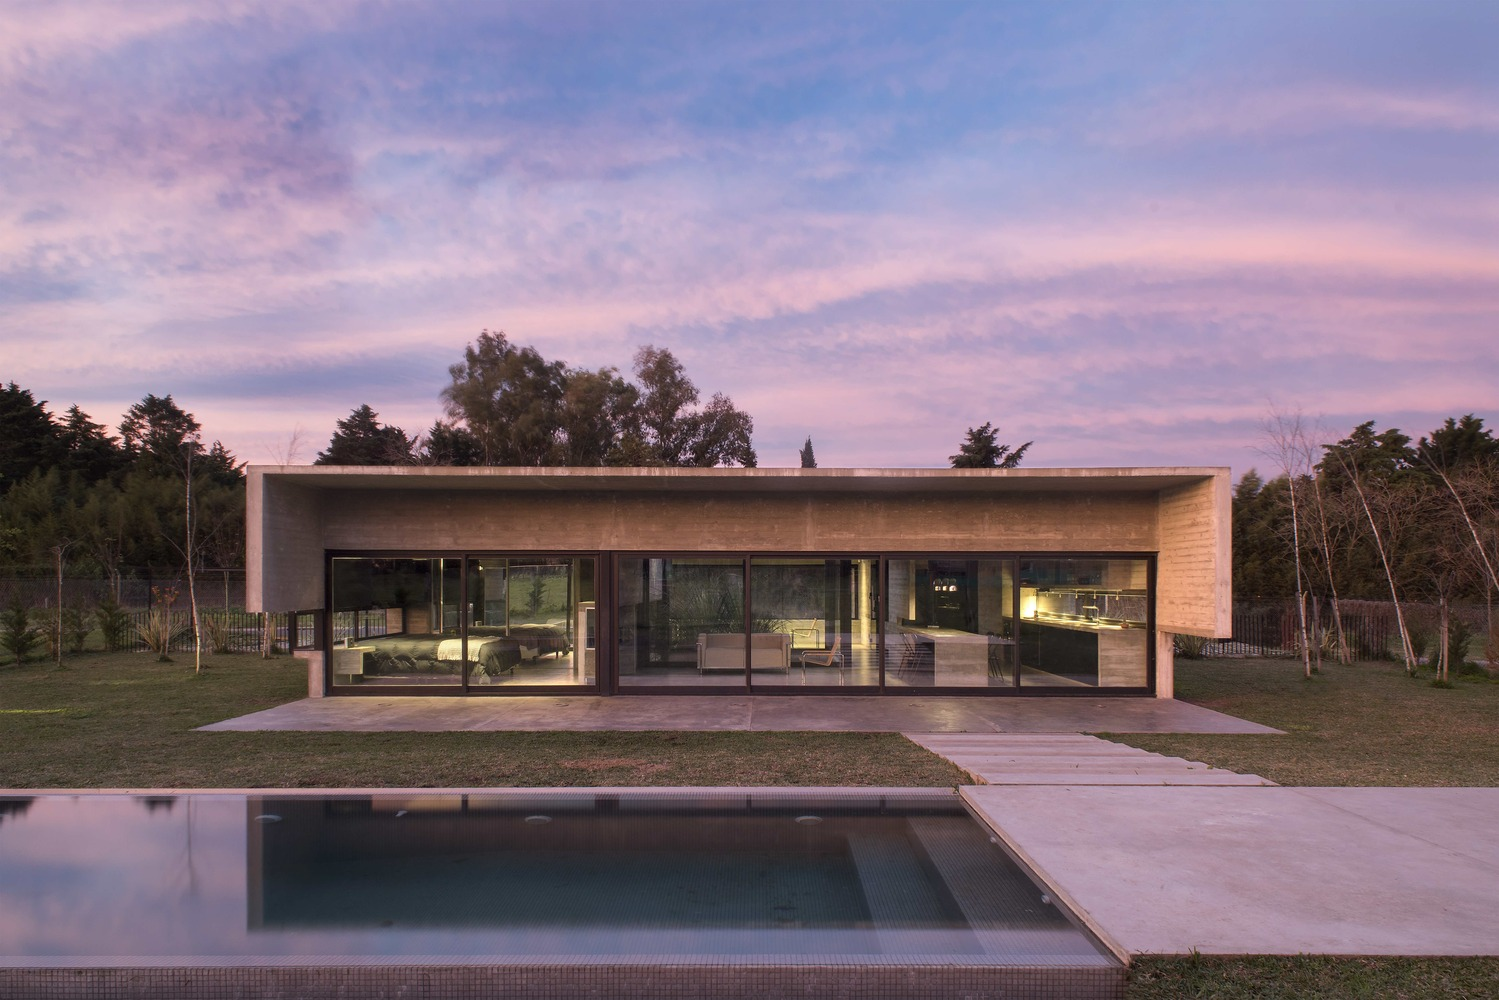 1_MACH House_Luciano Kruk_Inspirationist